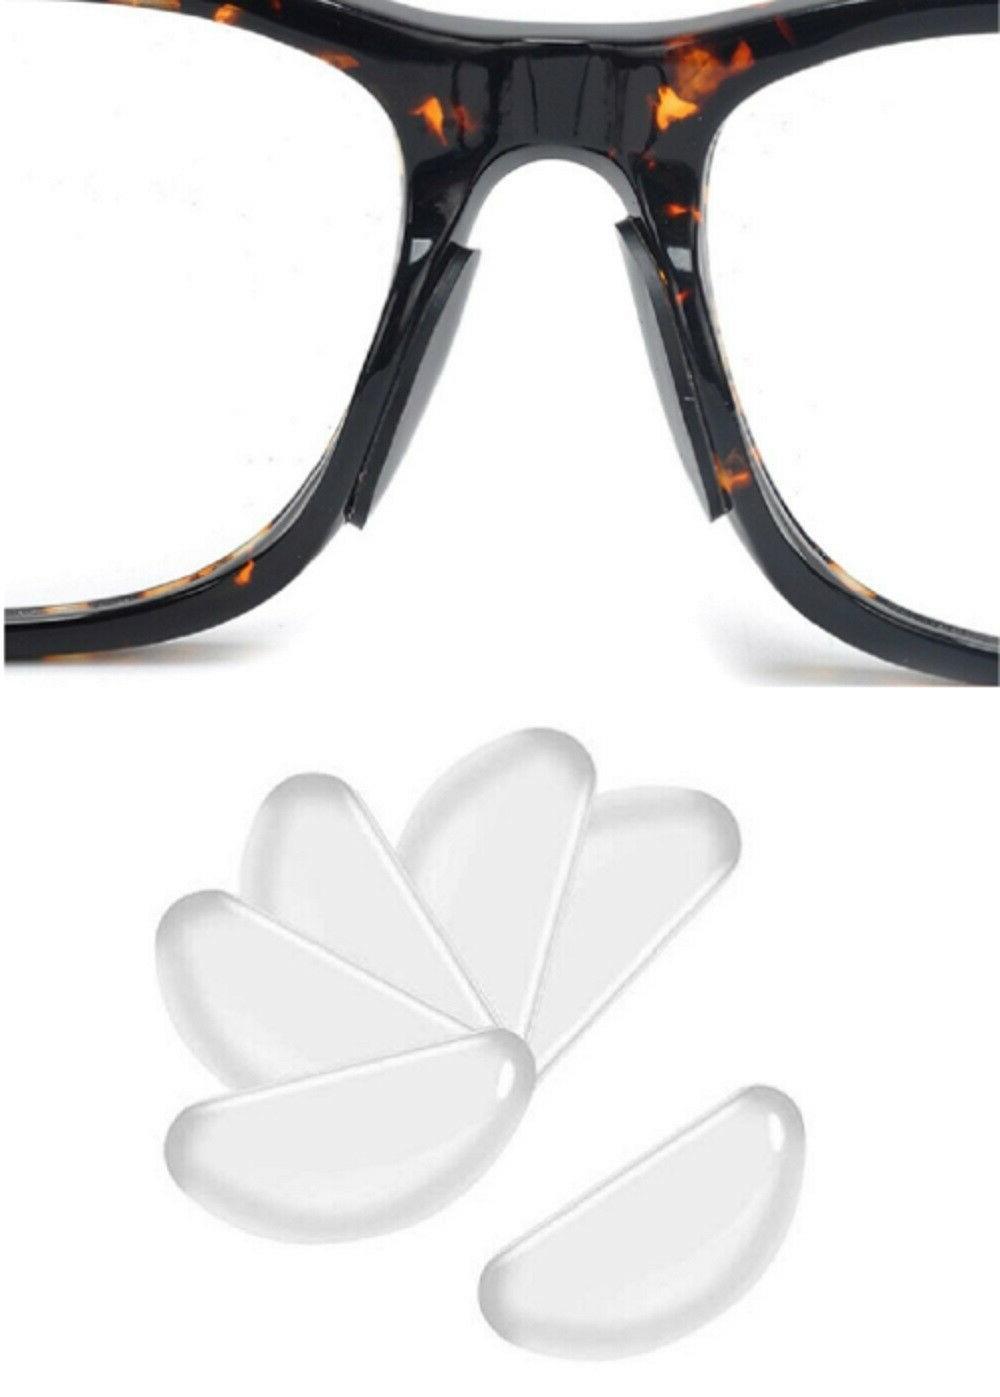 5 pairs anti slip silicone stick on